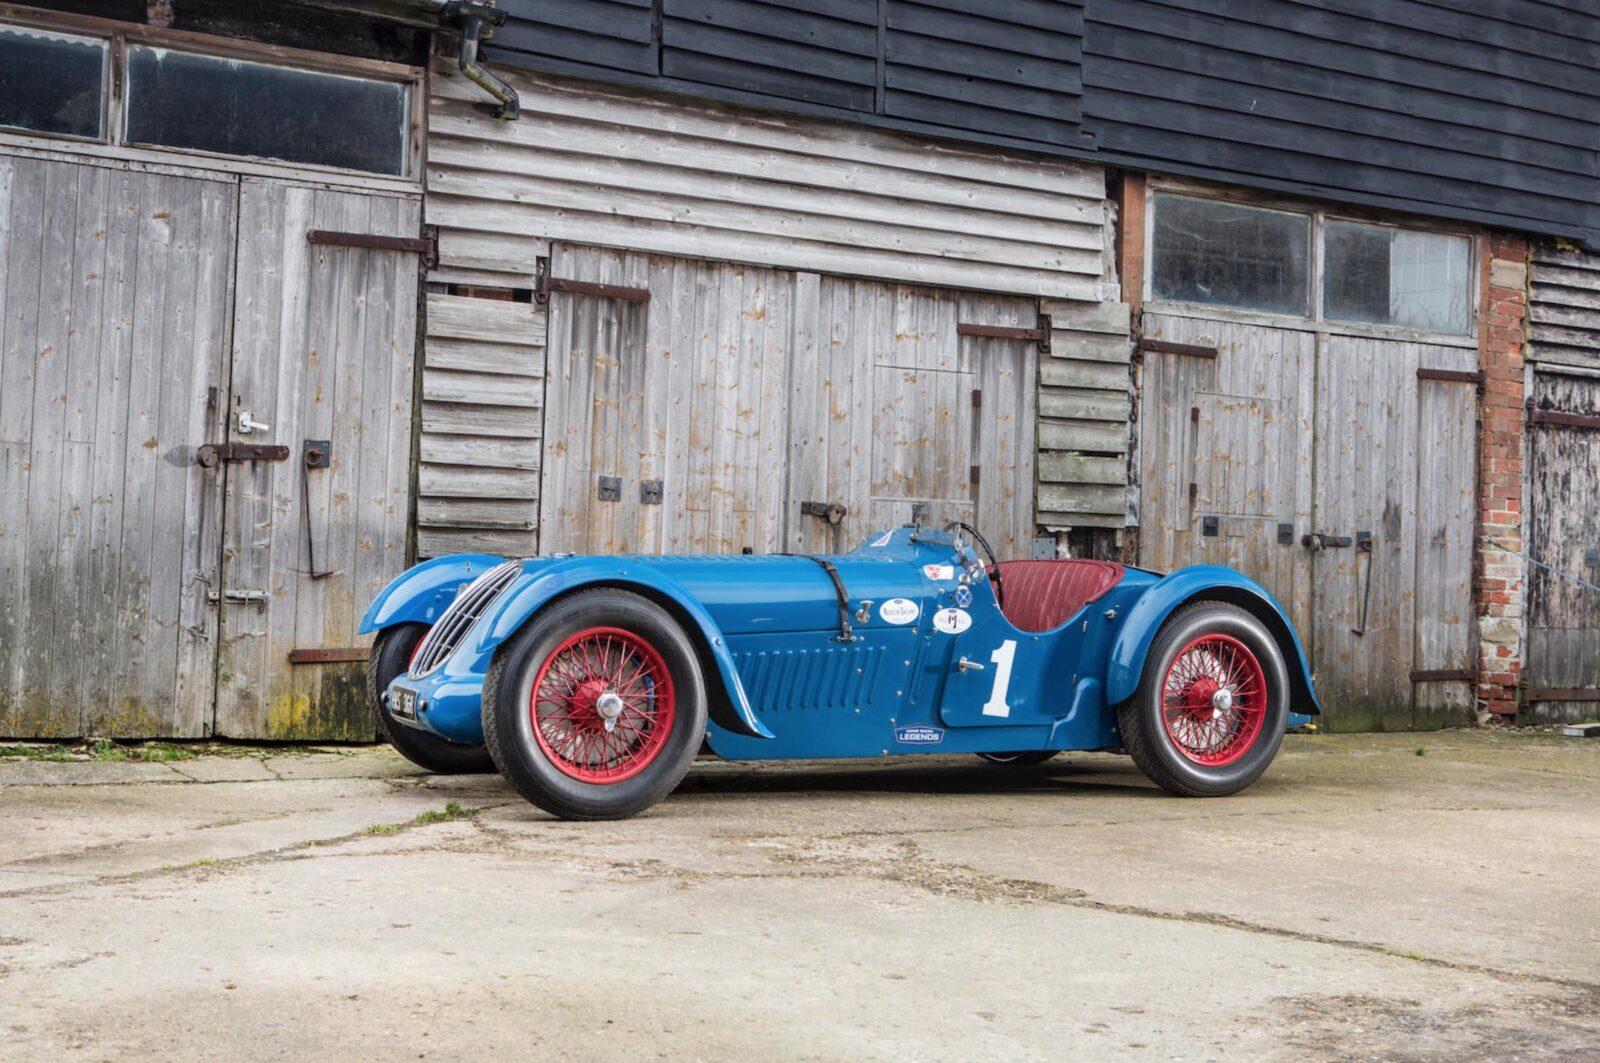 Alta 2 Litre Sports Car 1600x1063 - Rare Supercharged British Racer: 1936 2-Litre Alta Sports Car